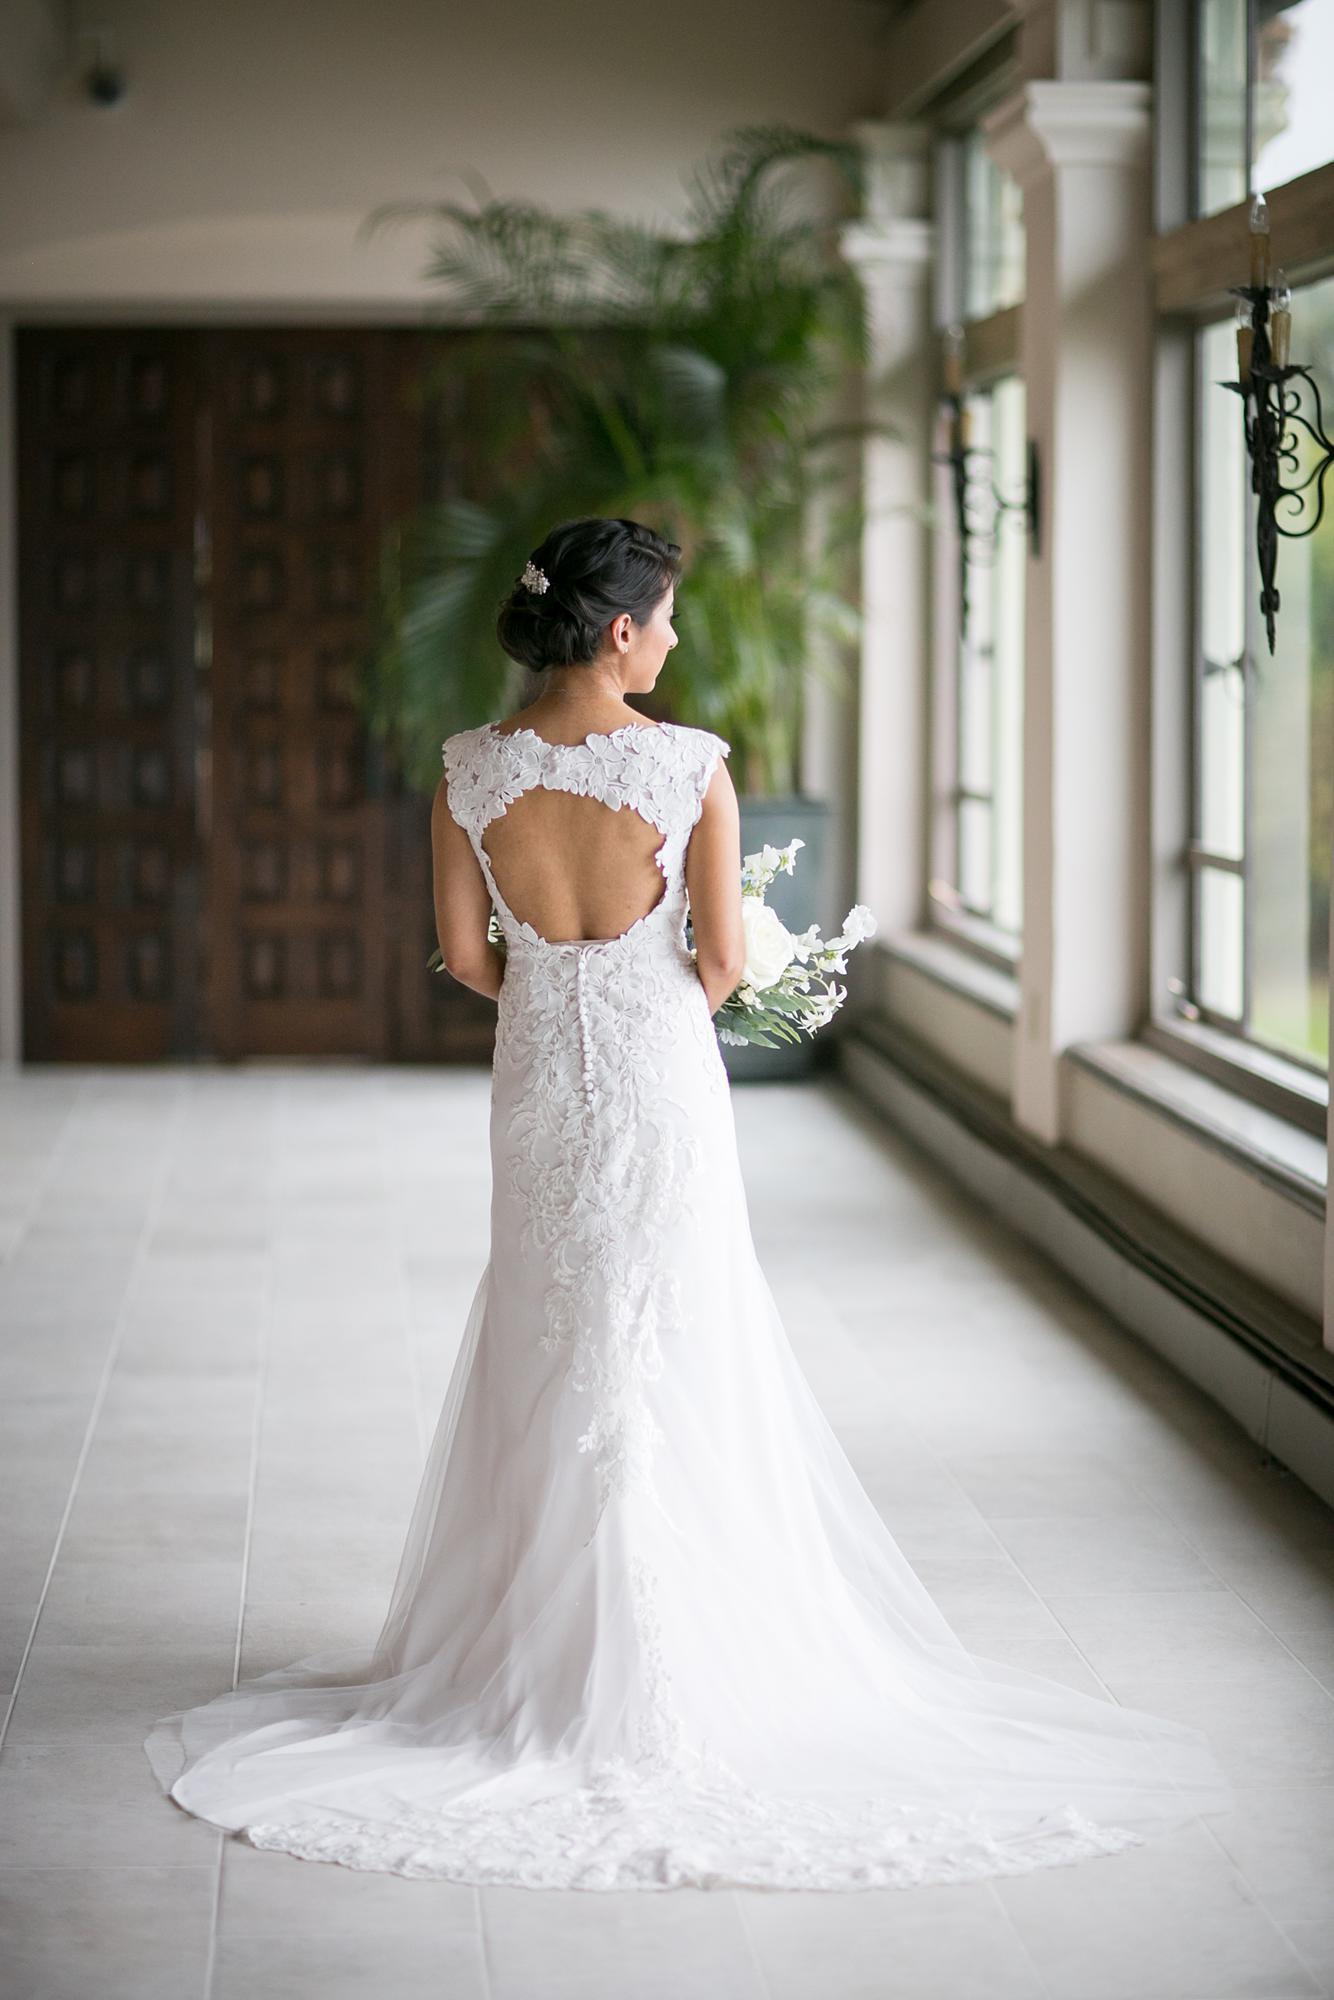 Bel Air Bay Club Wedding | Miki & Sonja Photography | mikiandsonja.com